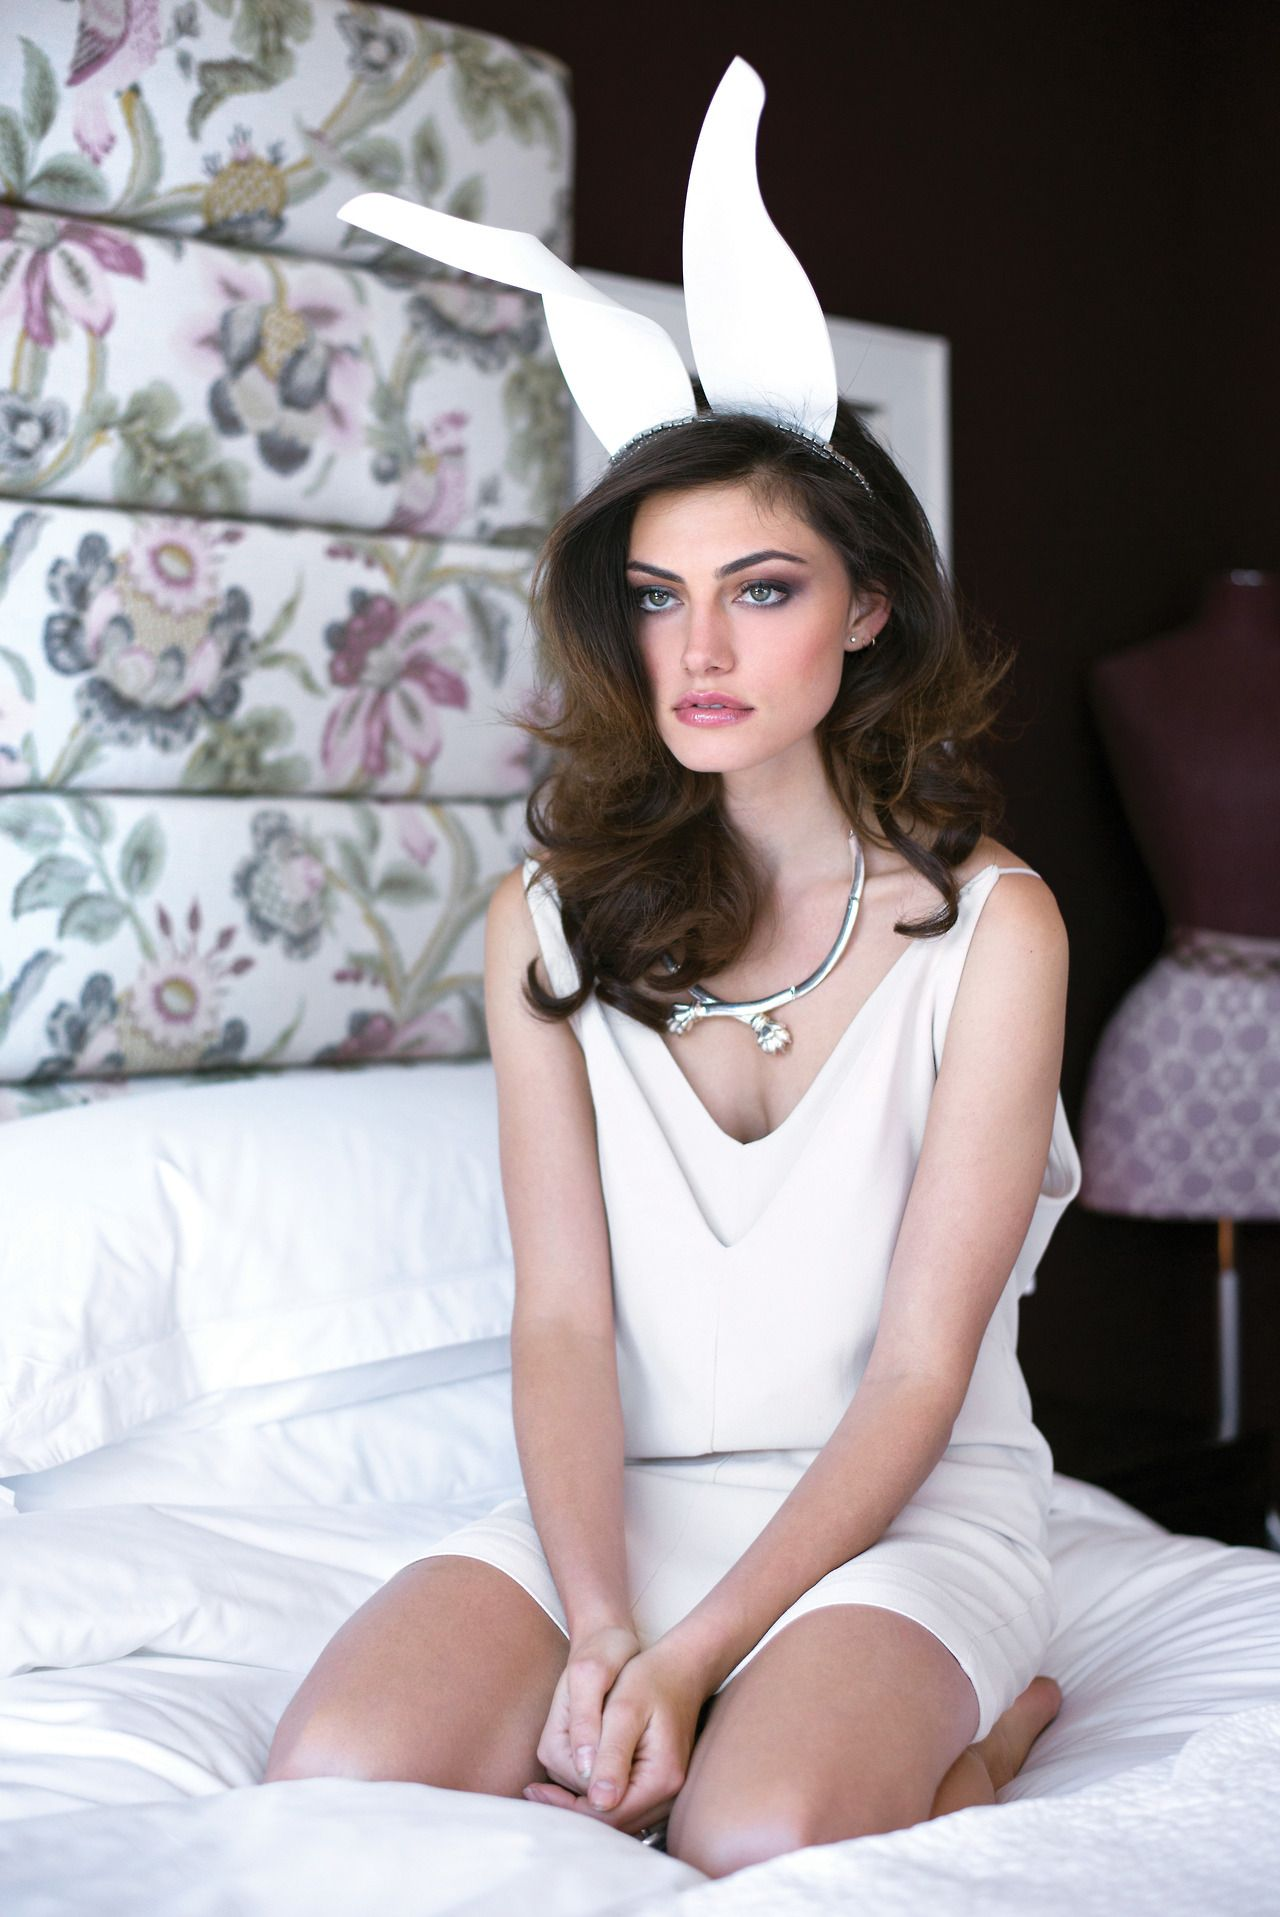 Phoebe Tonkin - Photoshoot for Maniac Magazine March/April ...